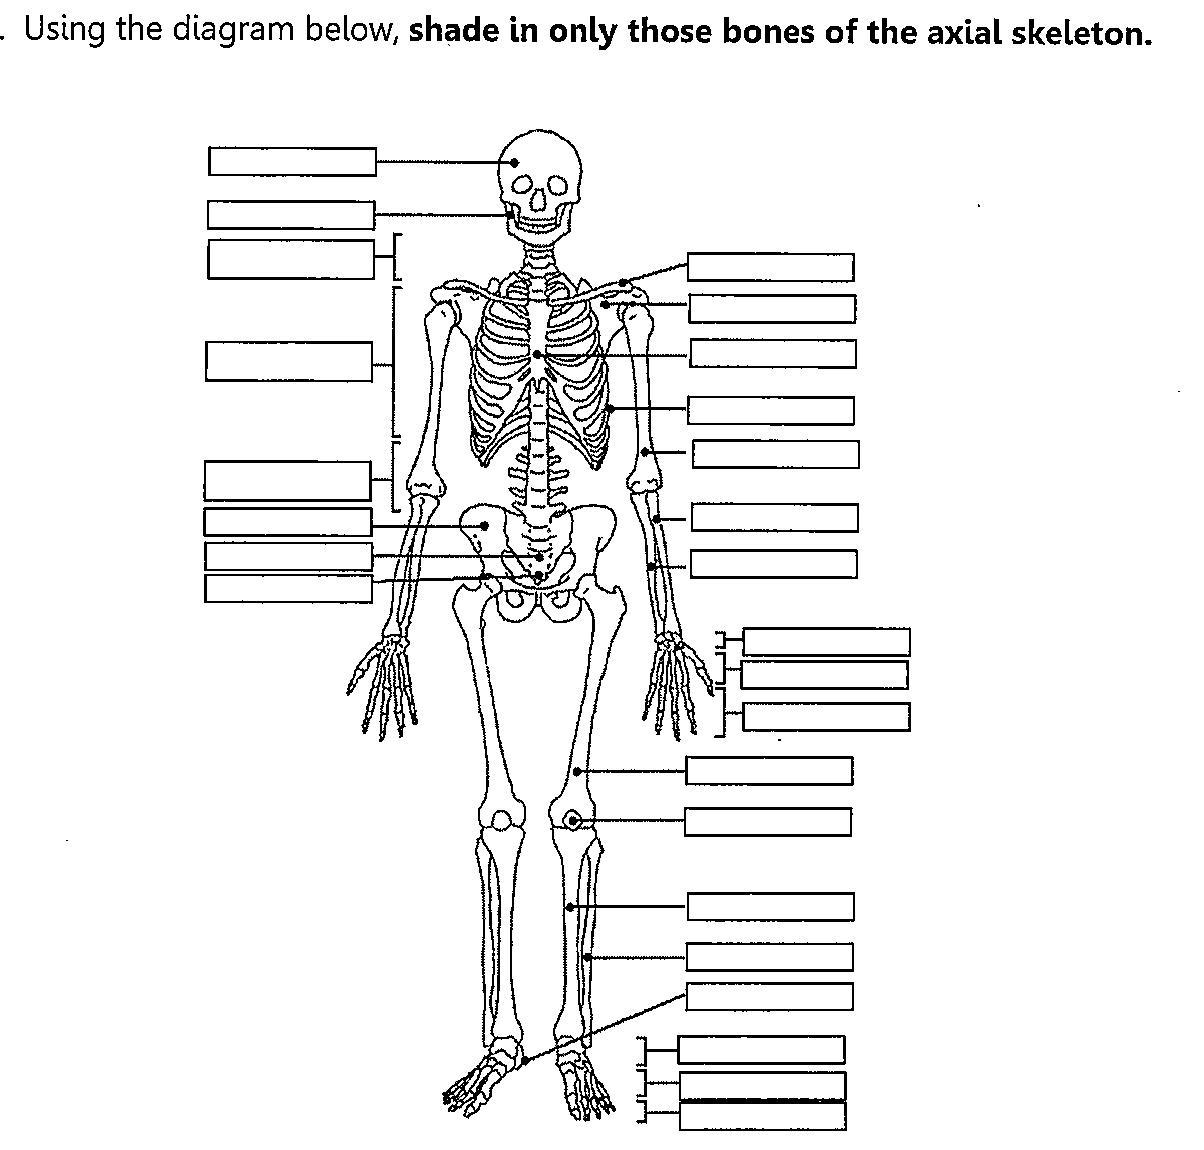 Skeletal System Fill In The Blank Worksheet Worksheets For All